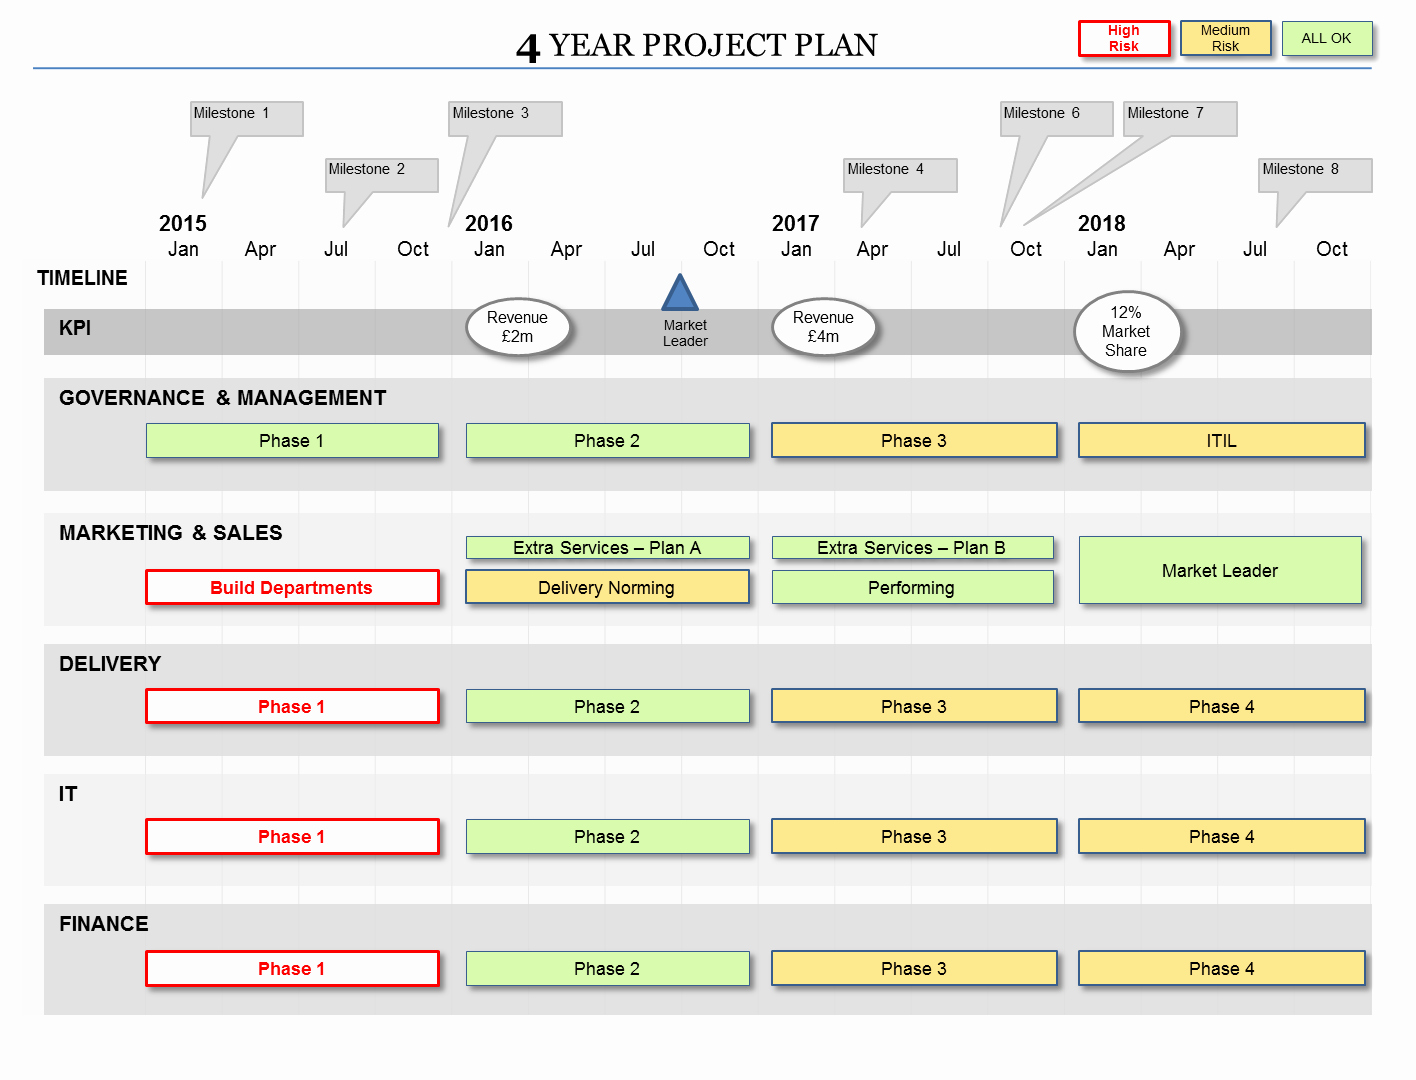 Design and Development Plan Template Inspirational Powerpoint Project Plan Template Flexible Planning formats